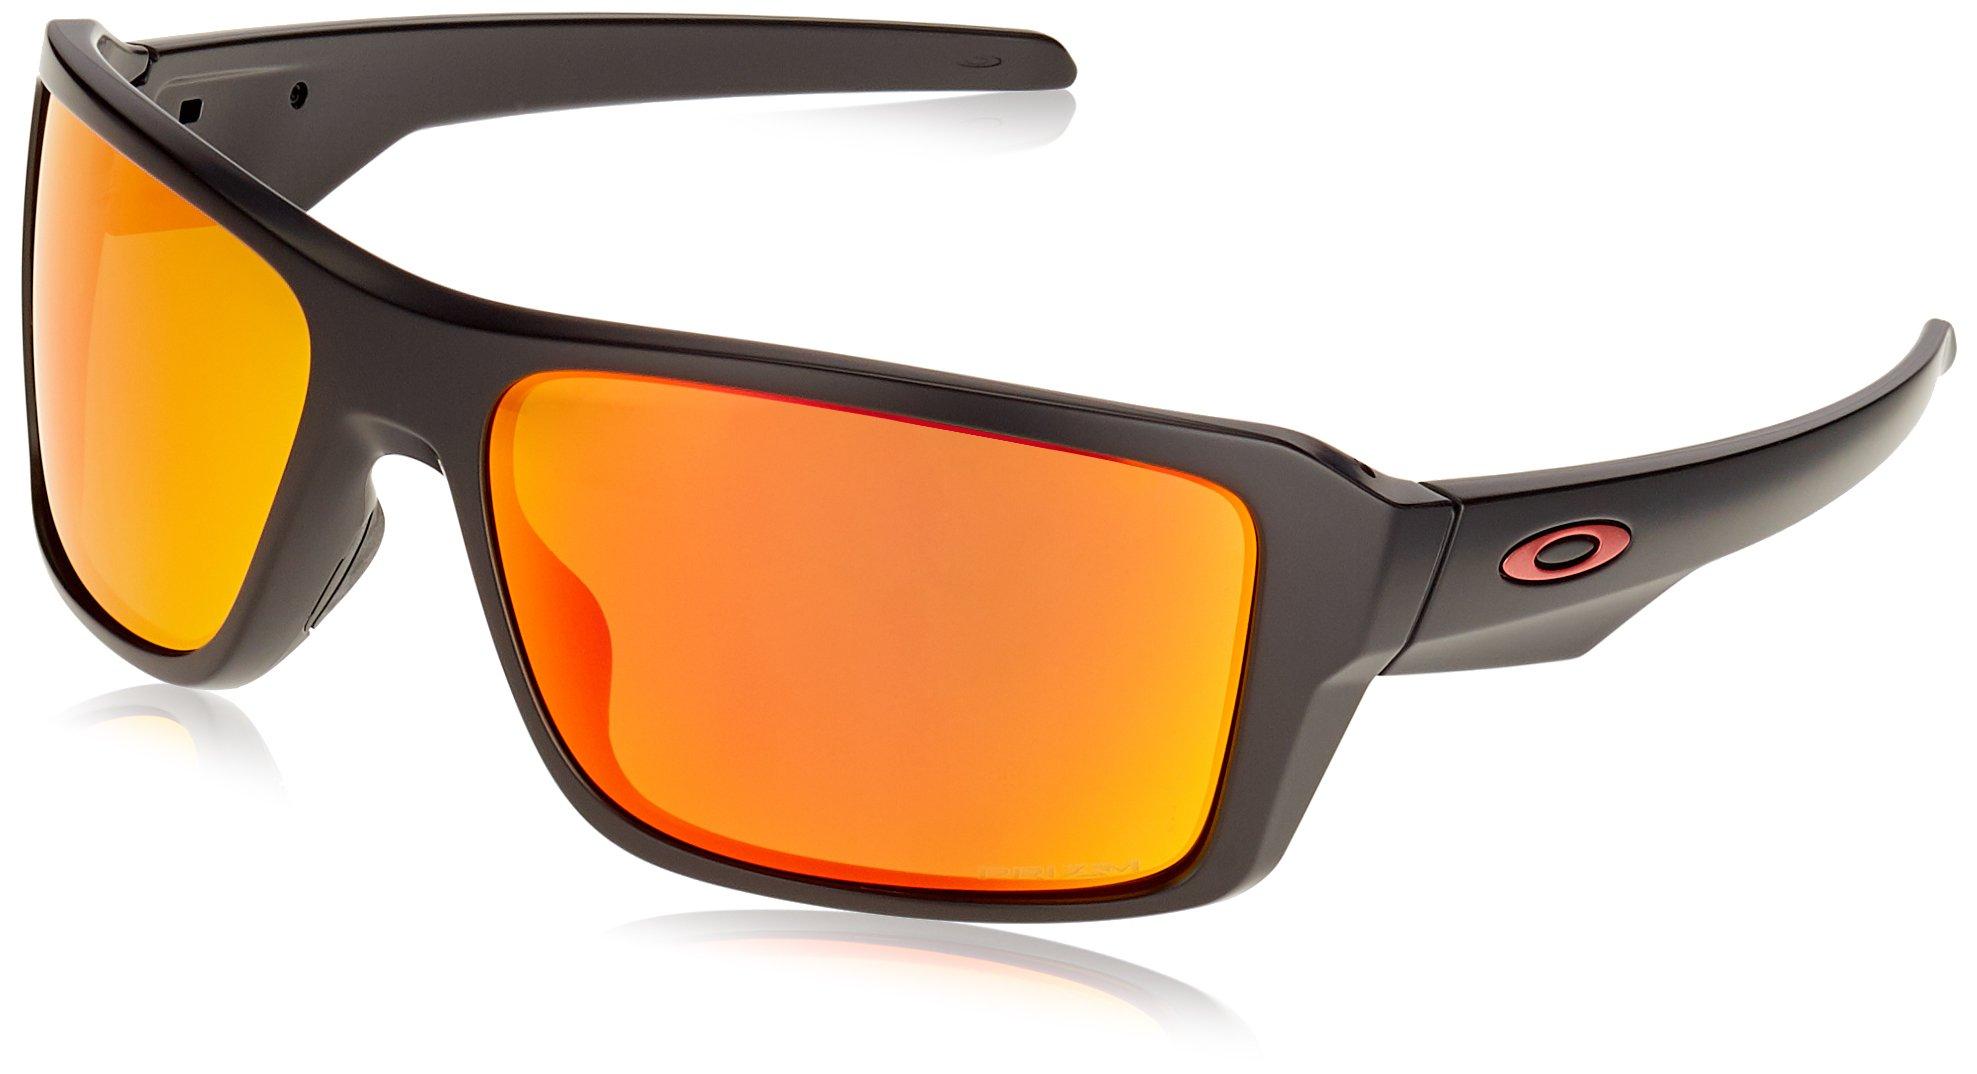 Oakley Men's Double Edge Iridium Rectangular Sunglasses, Matte Black/Prizm Ruby Polarized, 66.02 mm